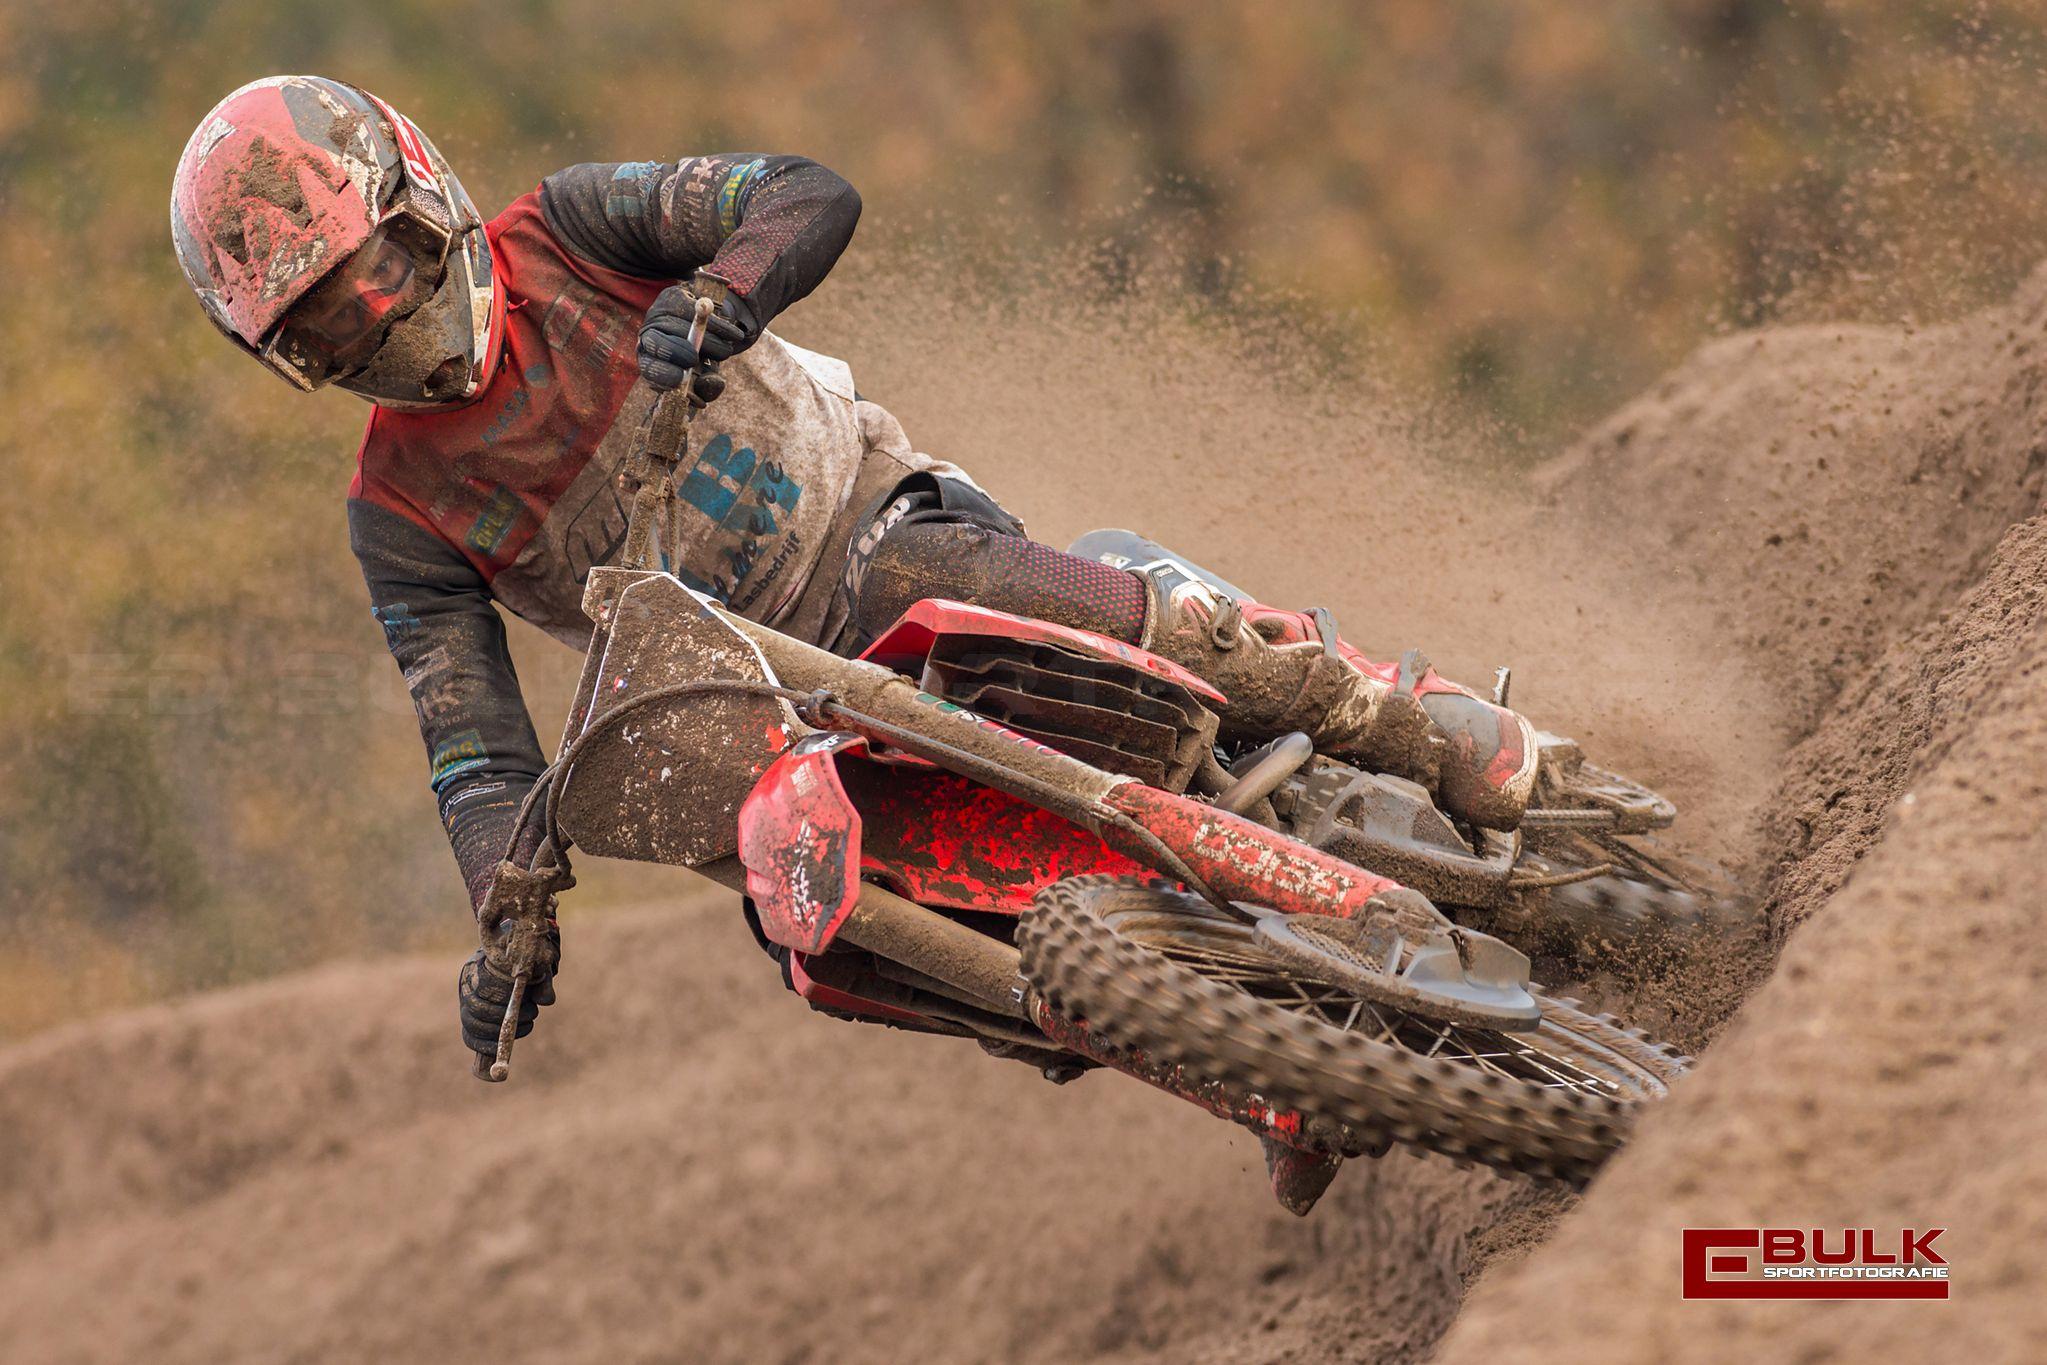 eebs1575-ed_bulk_sportfotografie